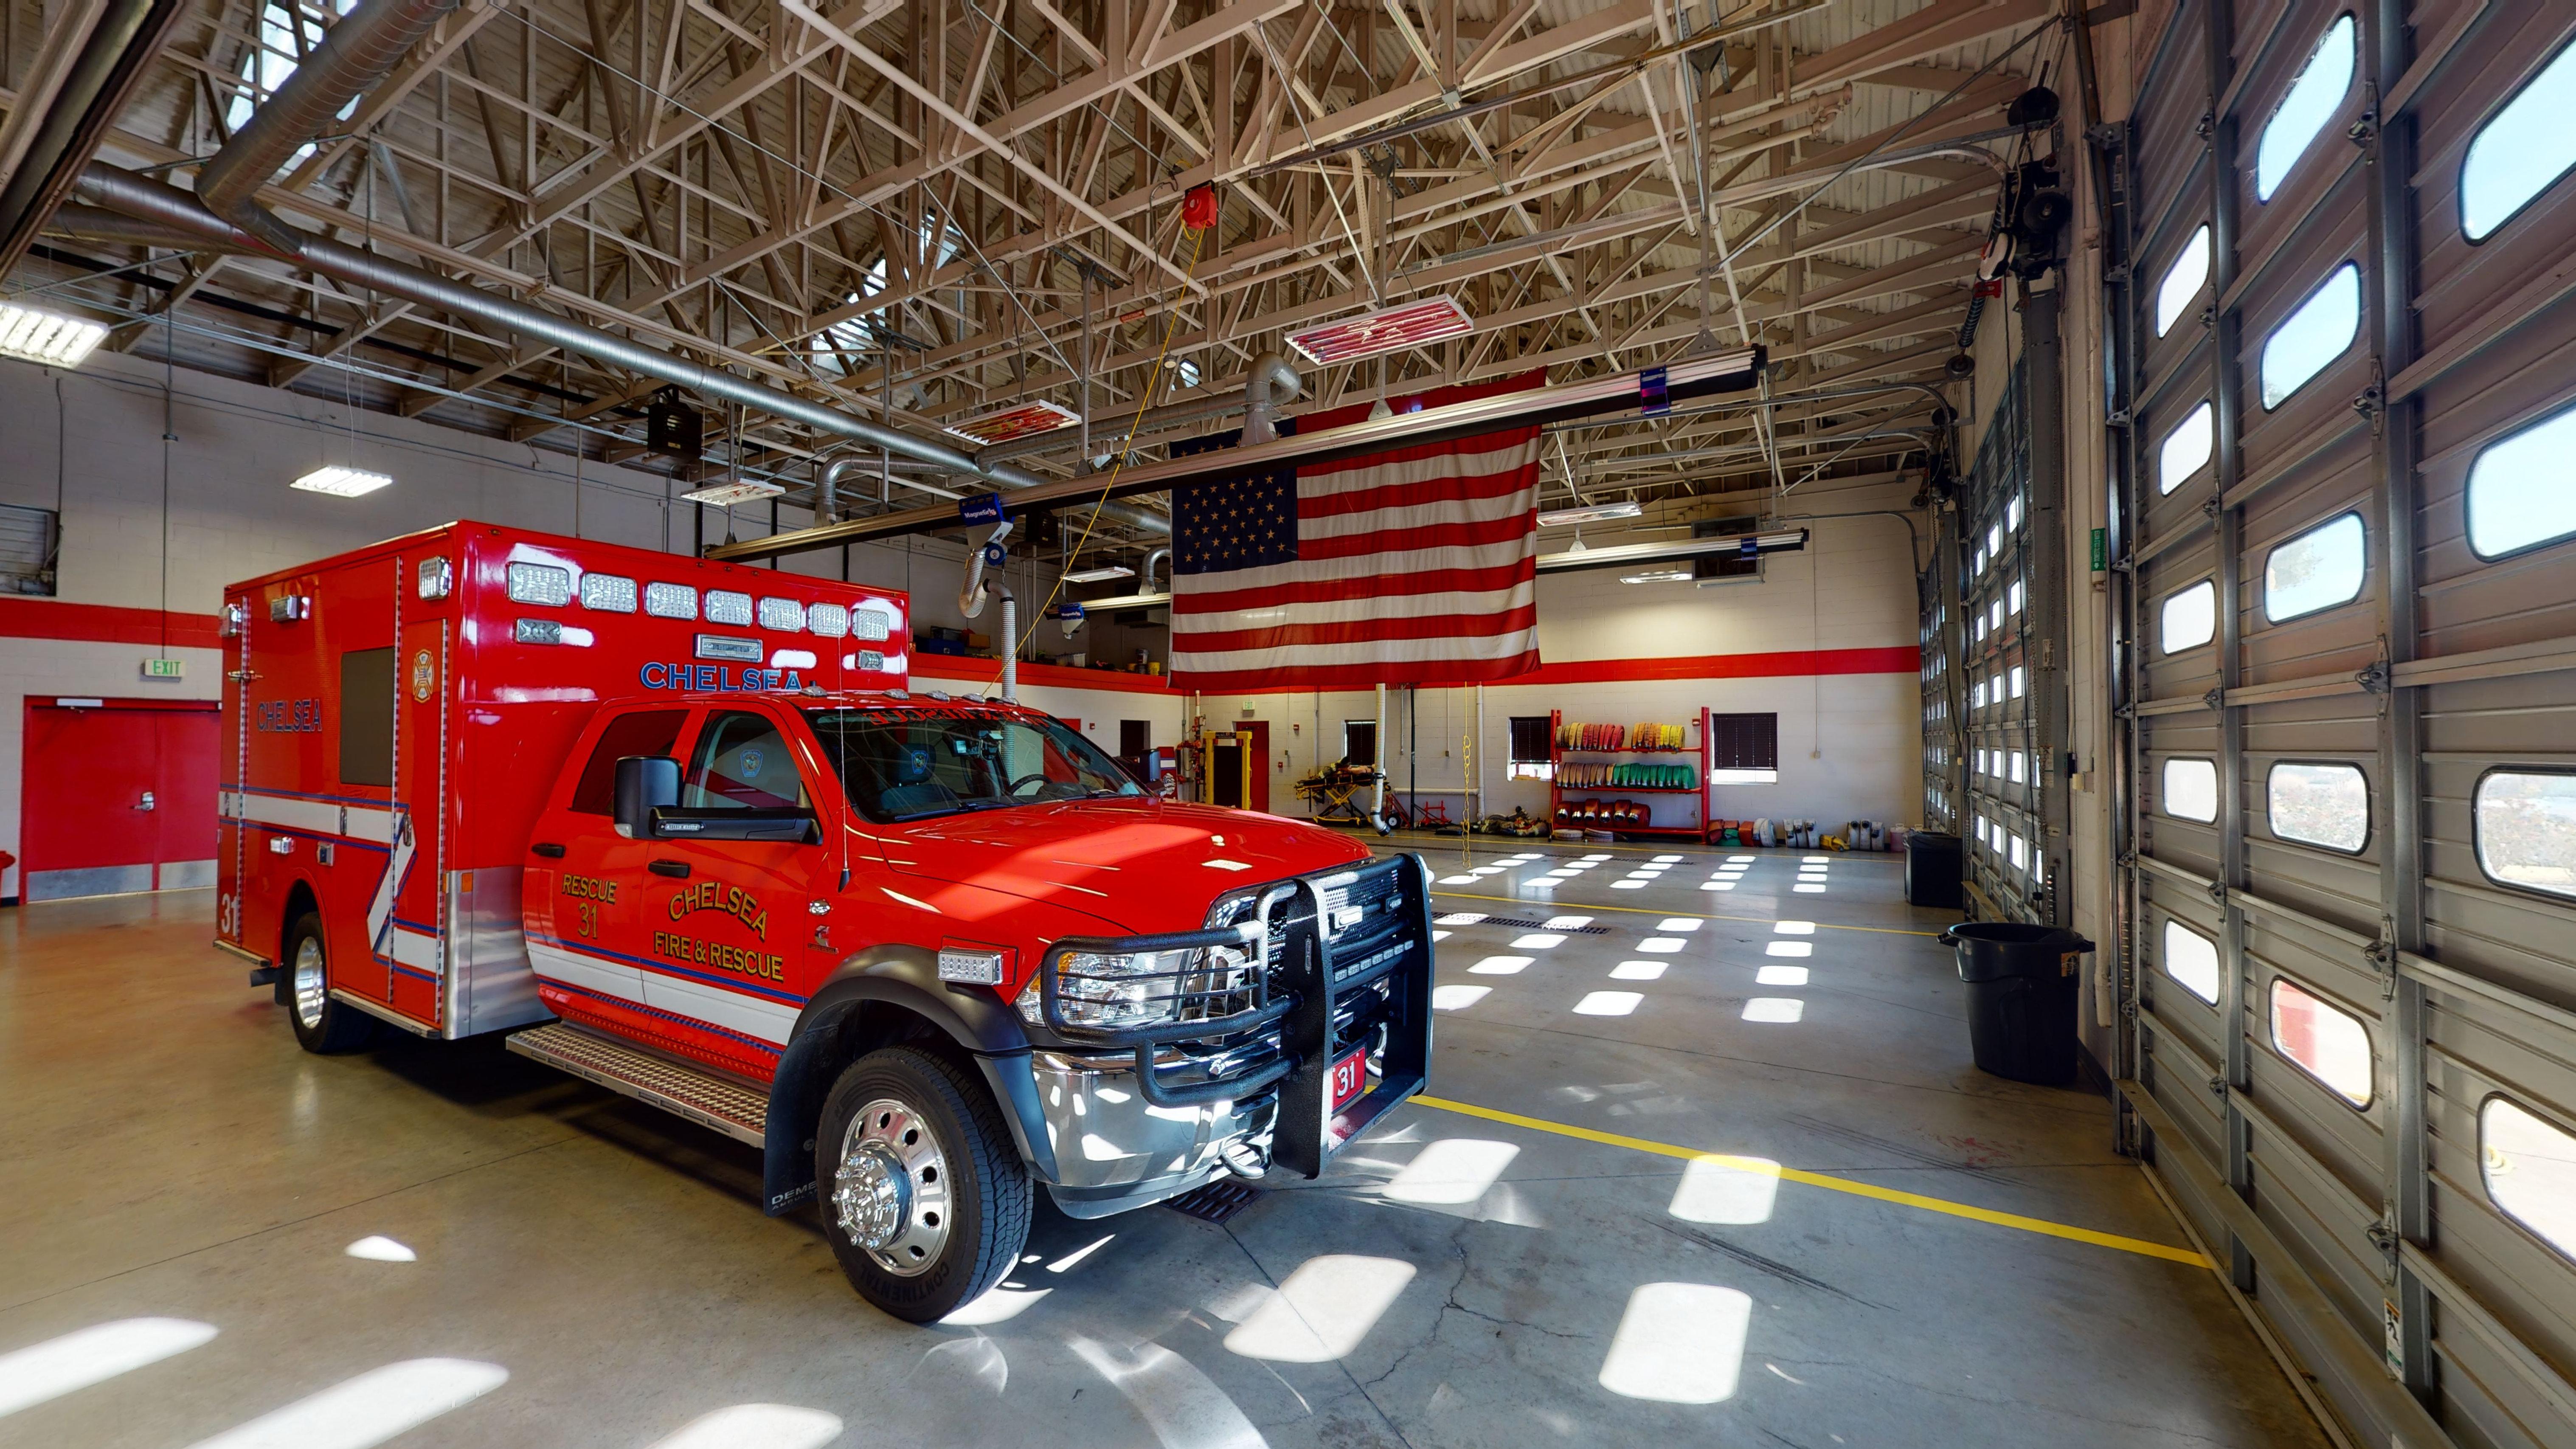 4_Chelsea-Fire-Rescue-Demers-151-06162021_101039